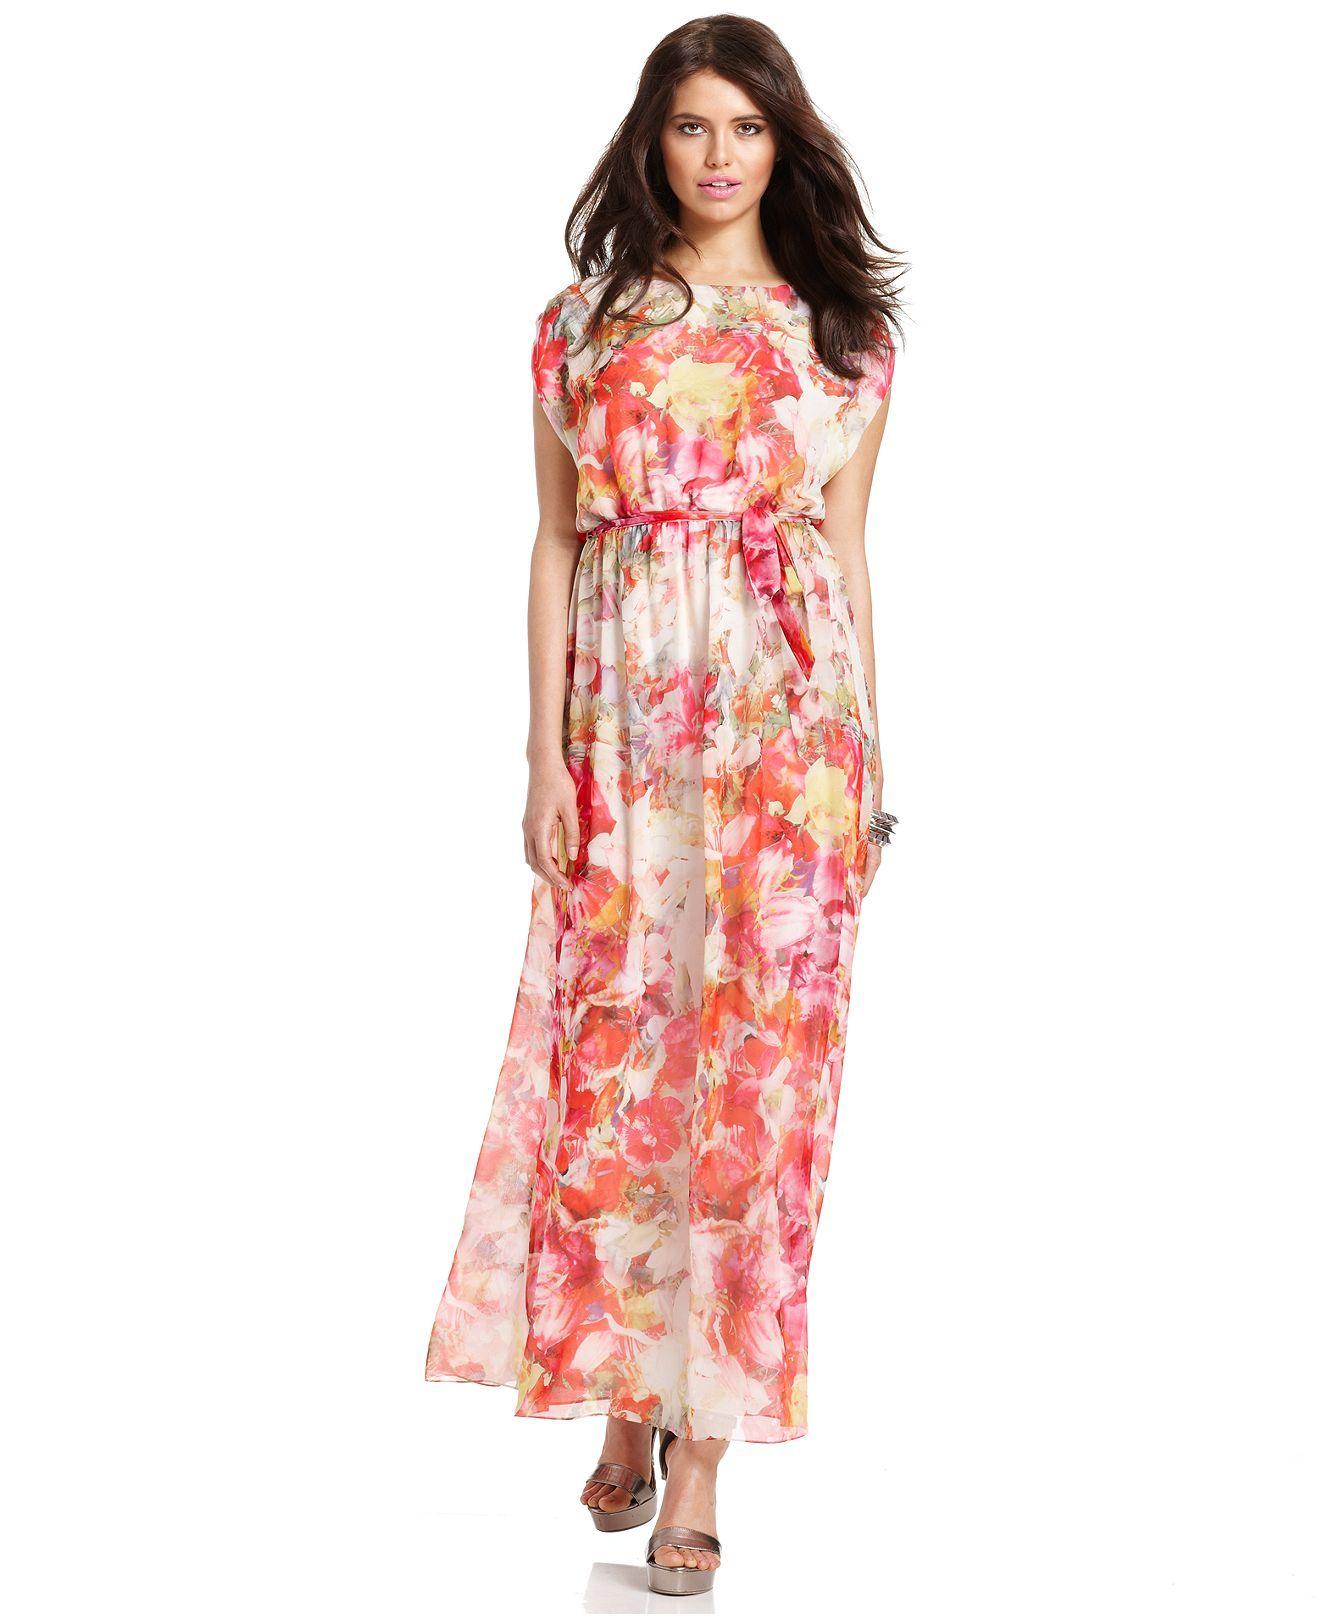 Vince Camuto Dress, Cap-Sleeve Floral-Print Maxi - Dresses - Women ...